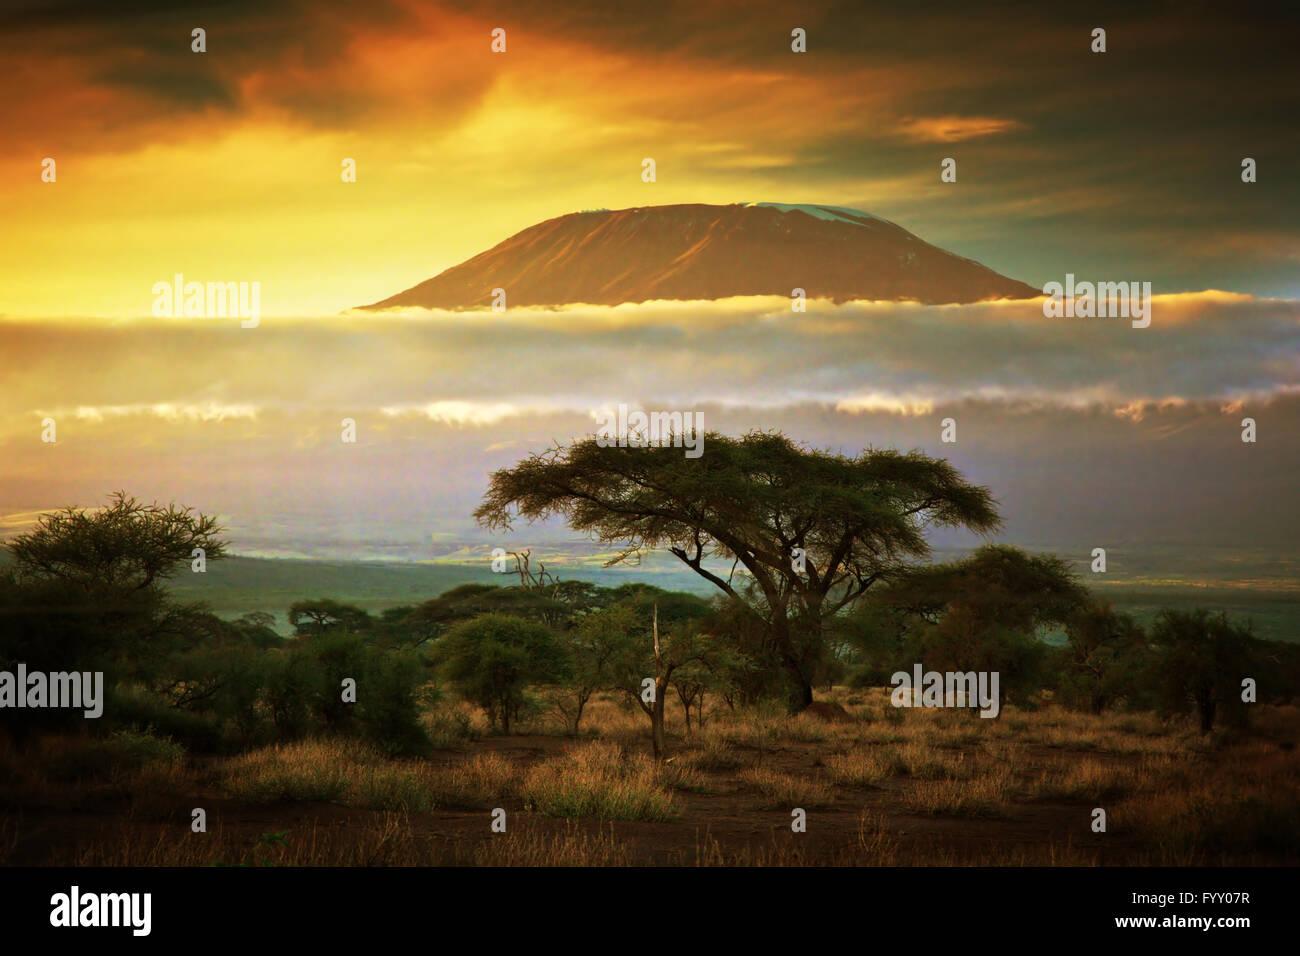 Mount Kilimanjaro. Savanna in Amboseli, Kenya - Stock Image